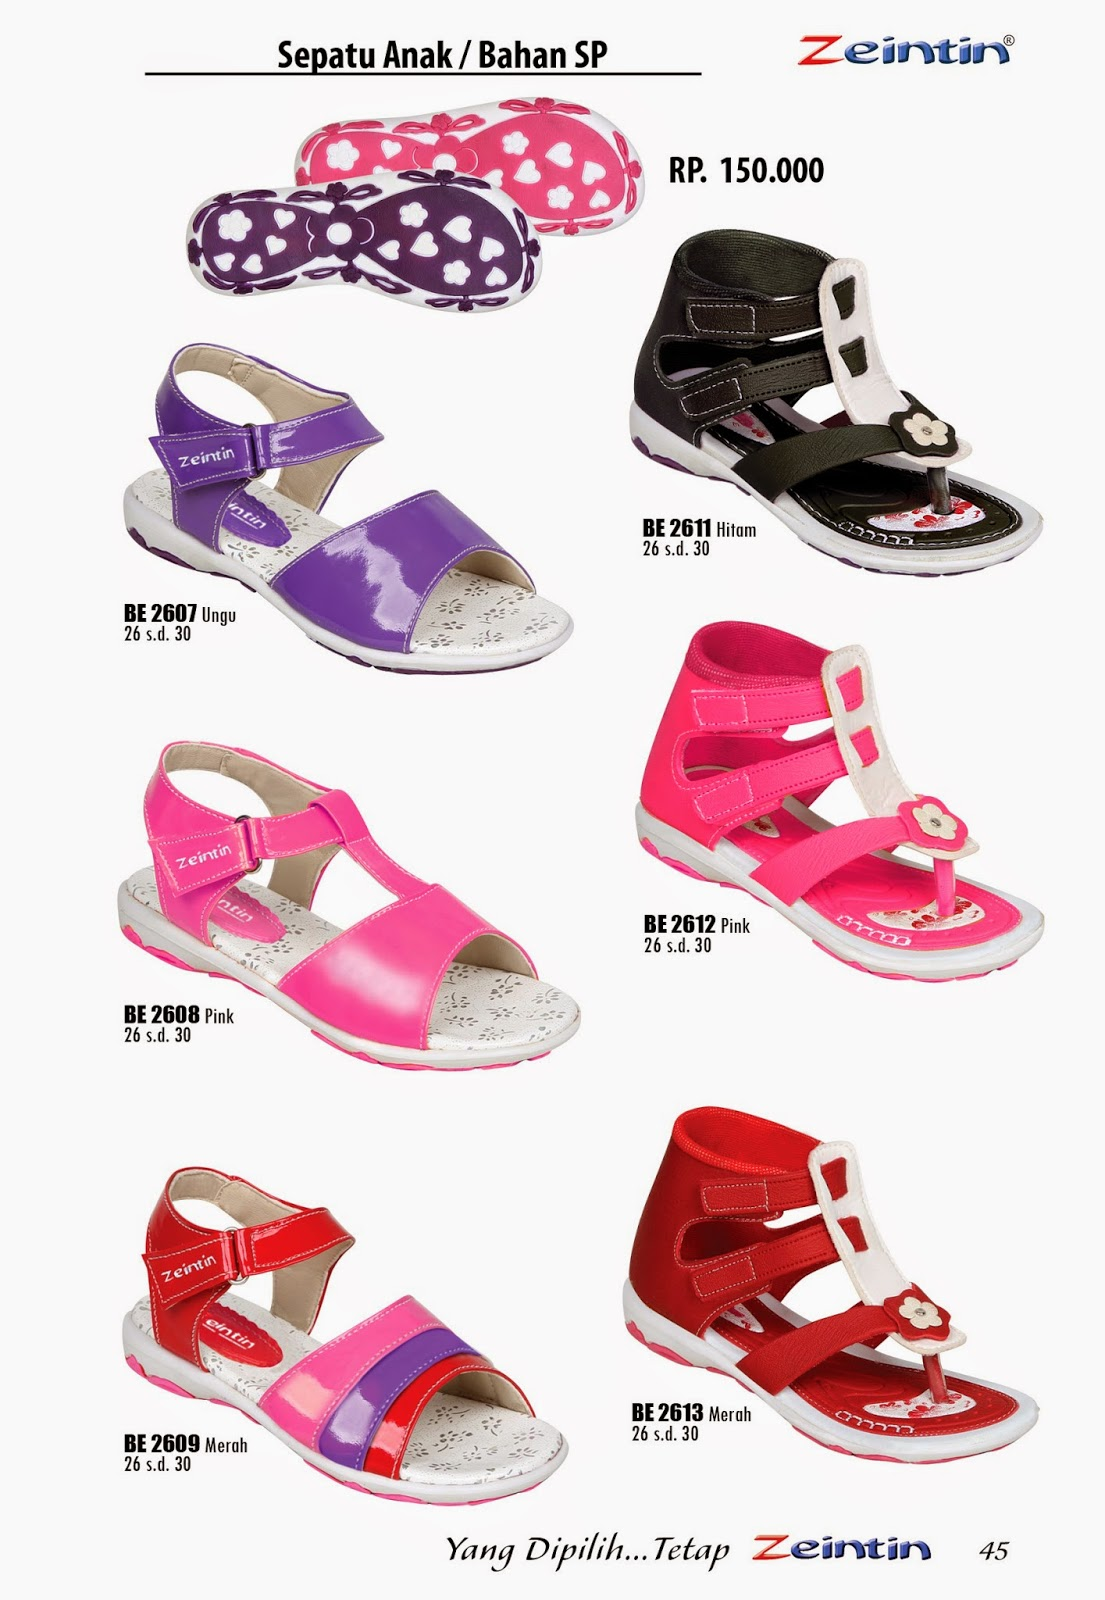 Sandal Anak Wanita Zeintin Katalog Edisi Brilian 11